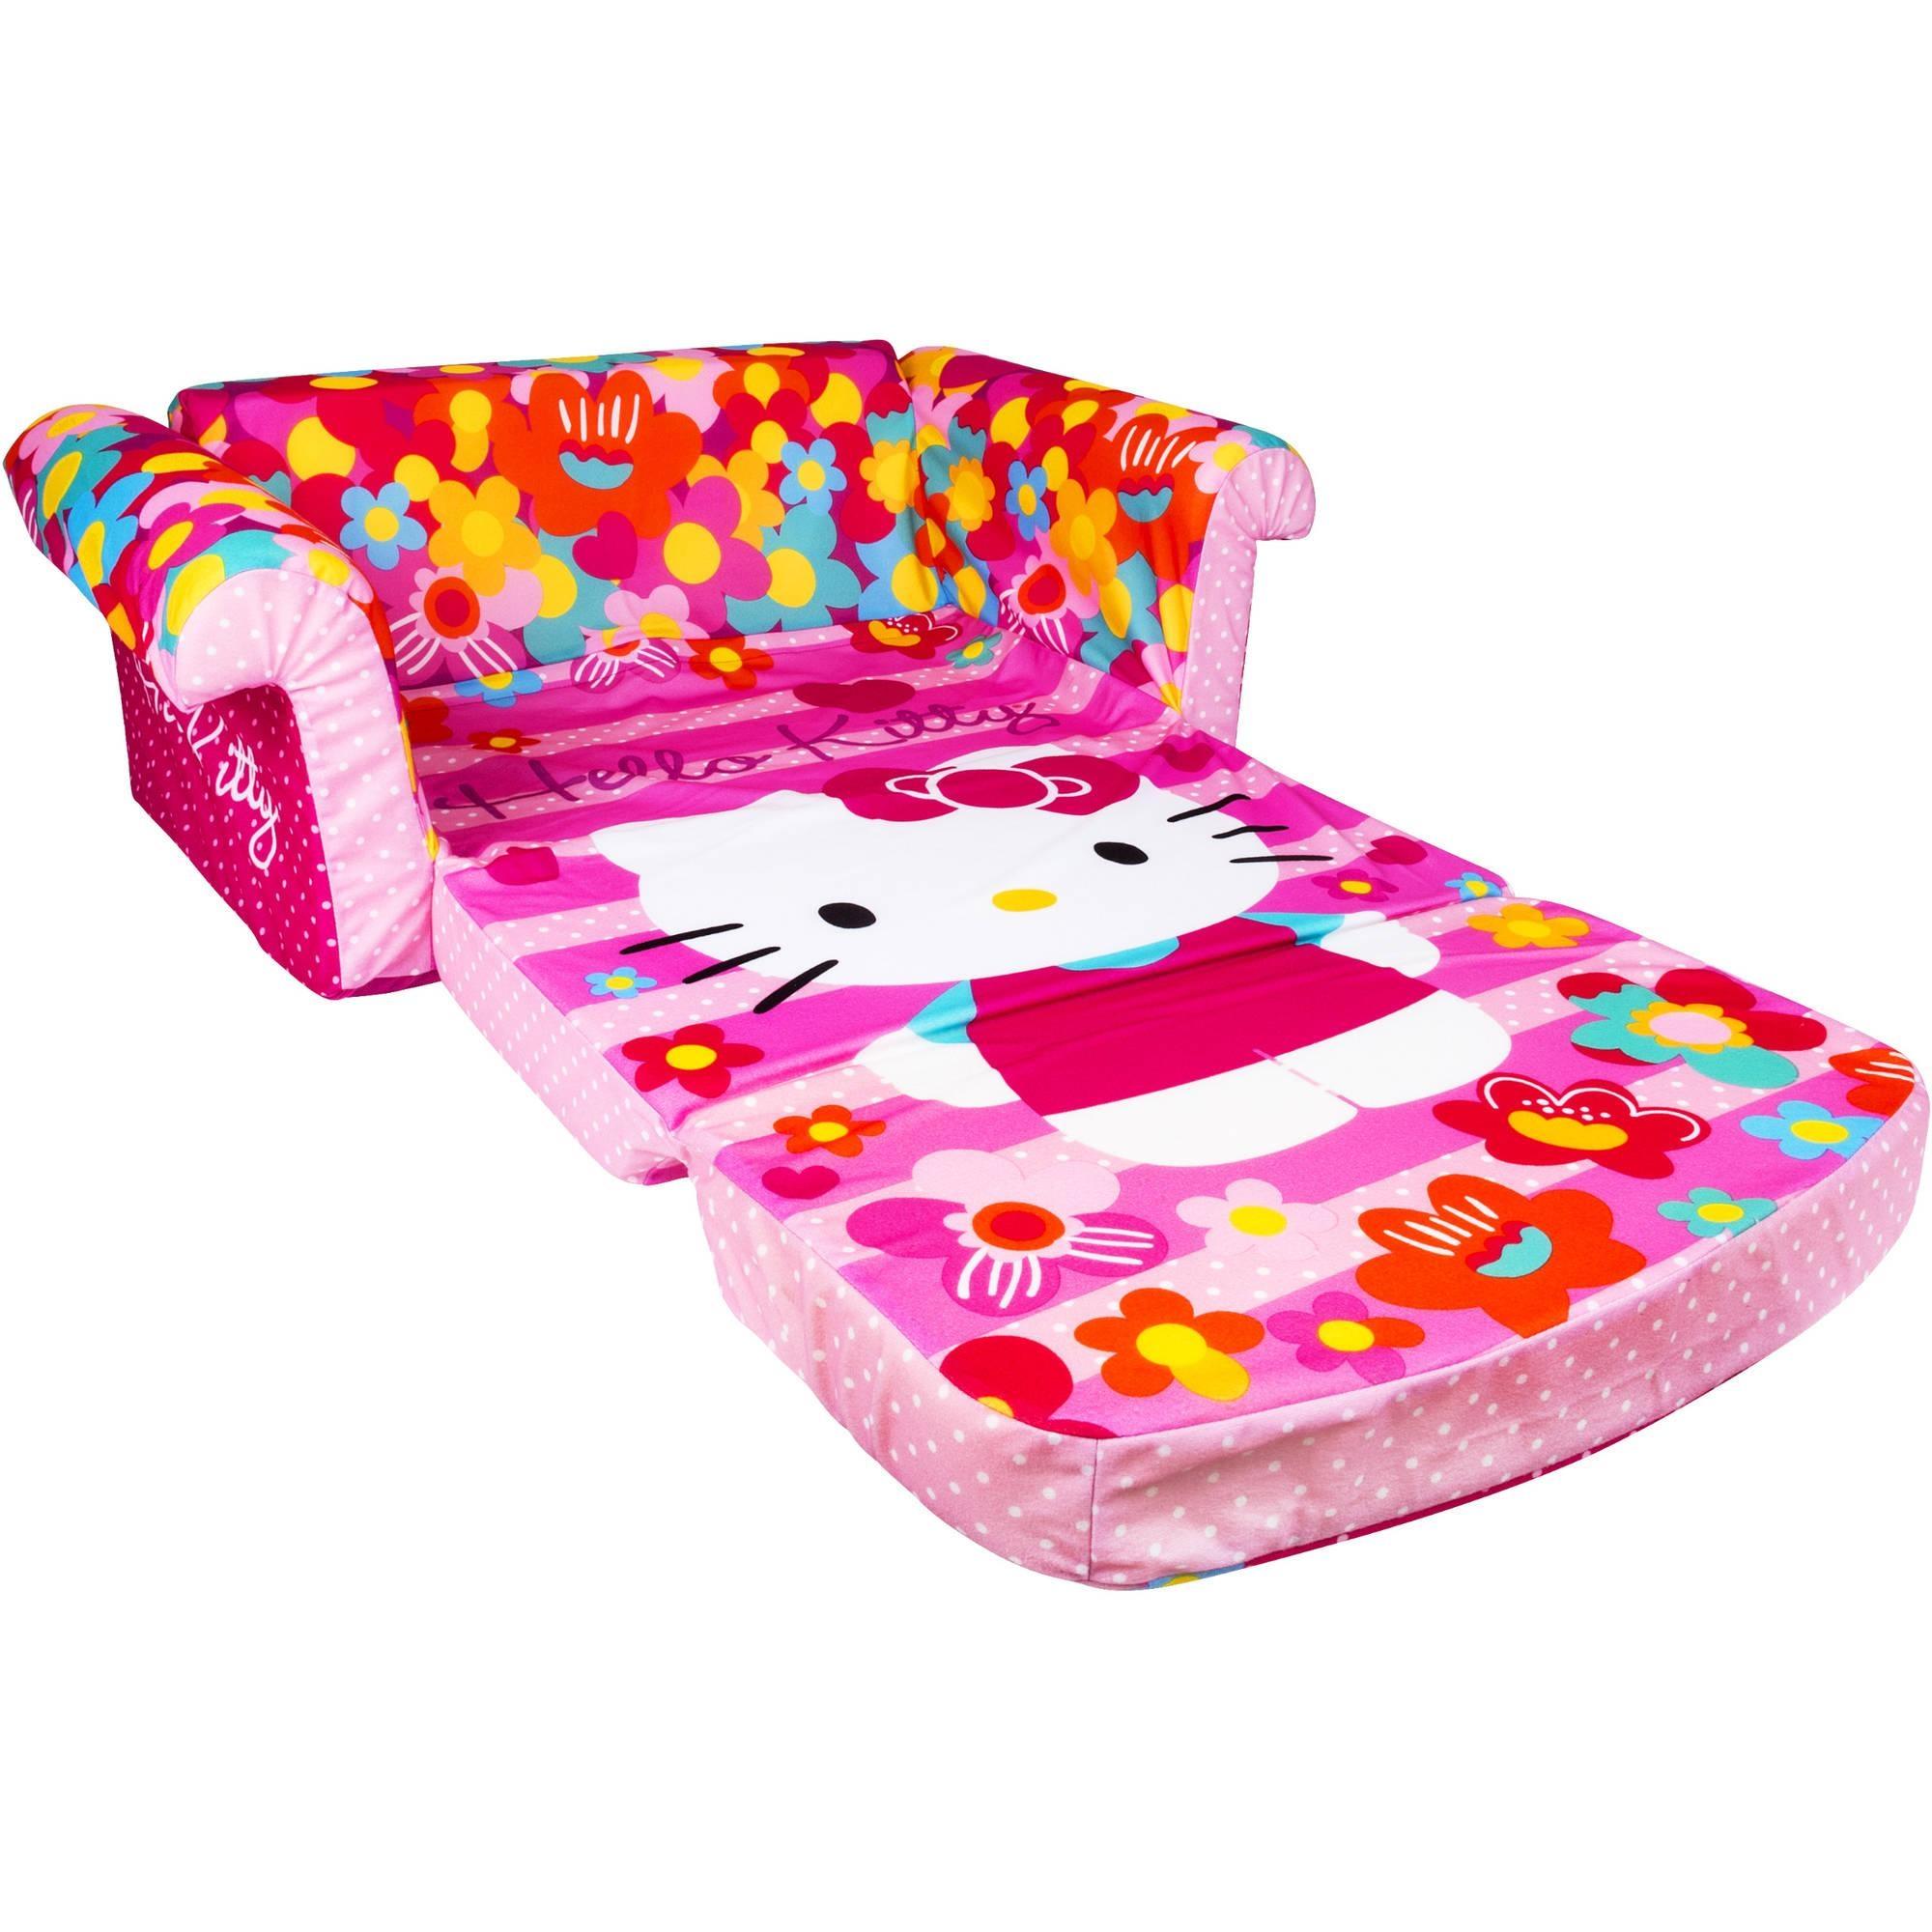 Sofas Center : Flip Open Sofa Spin Master Marshmallow Furniture For Princess Flip Open Sofas (View 17 of 20)